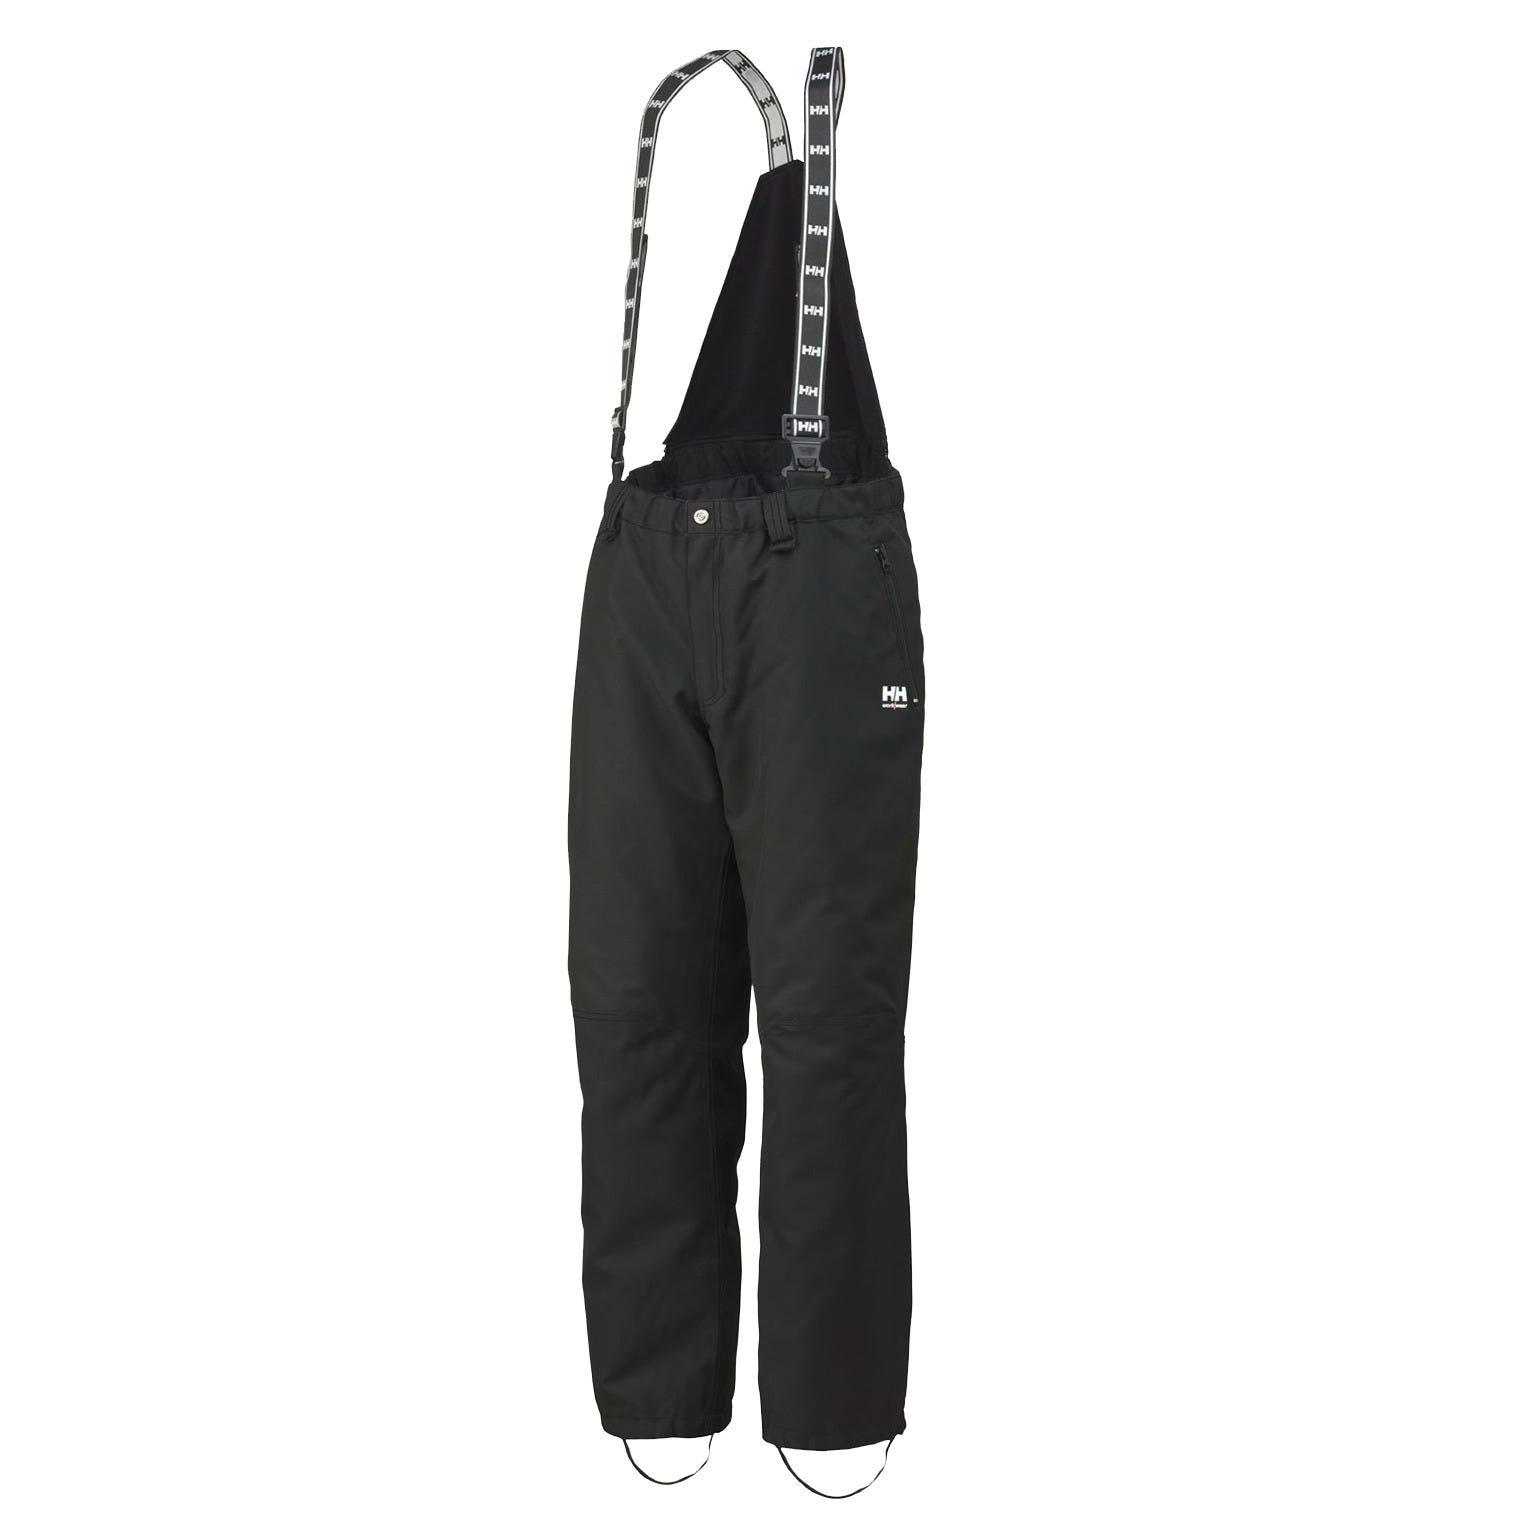 HH Workwear Helly Hansen WorkwearBerg Pant Black S